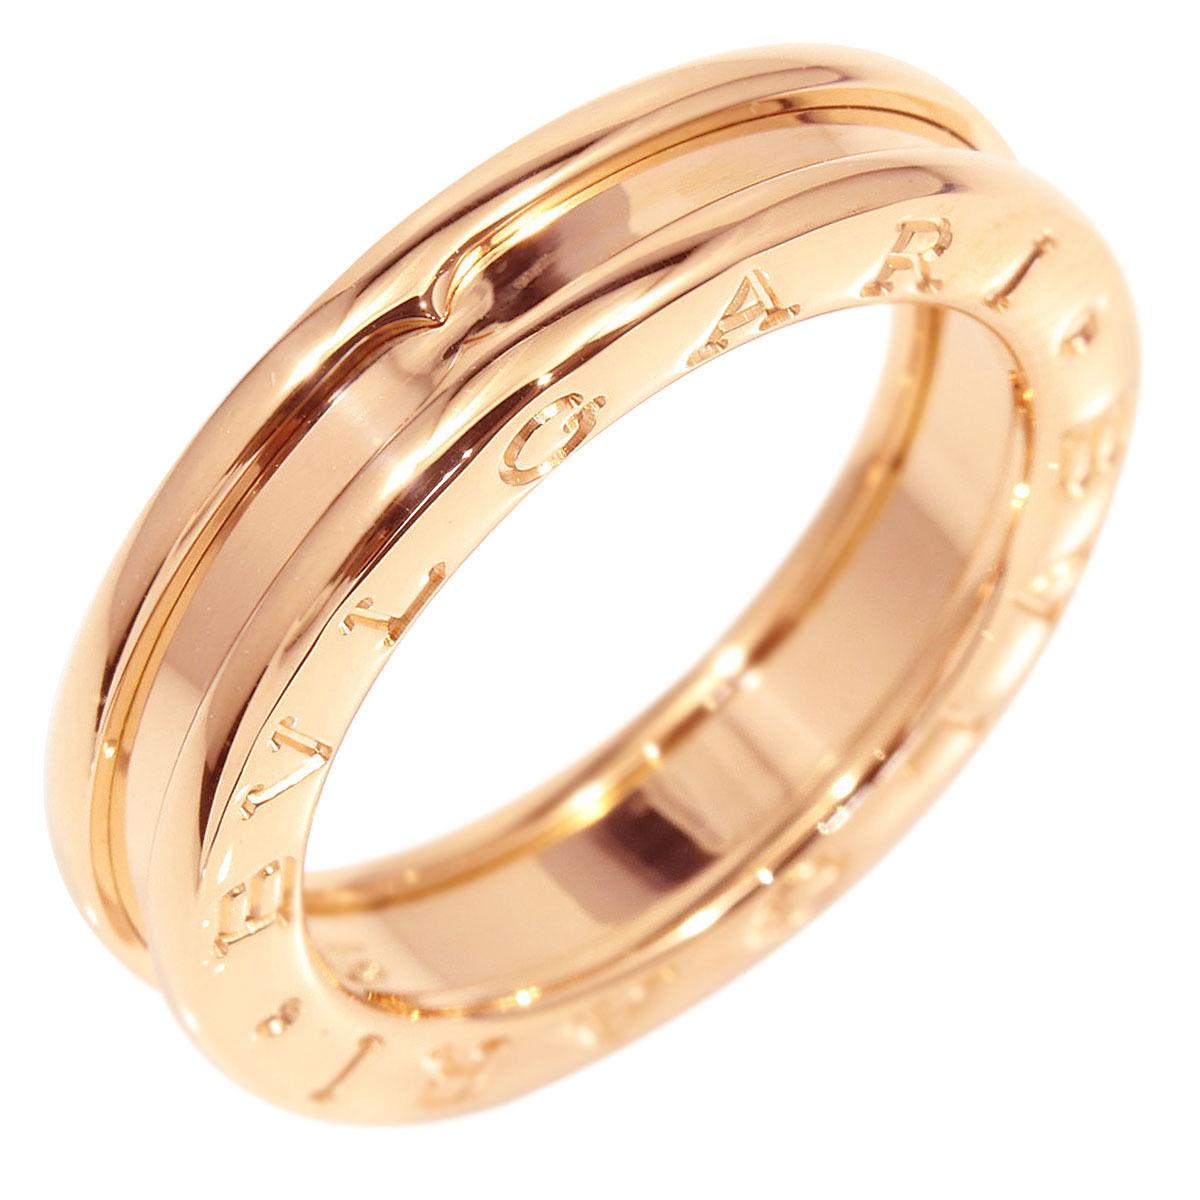 "Image of ""Bulgari 18K Rose Gold B-Zero 1 Band Ring Size 6"""